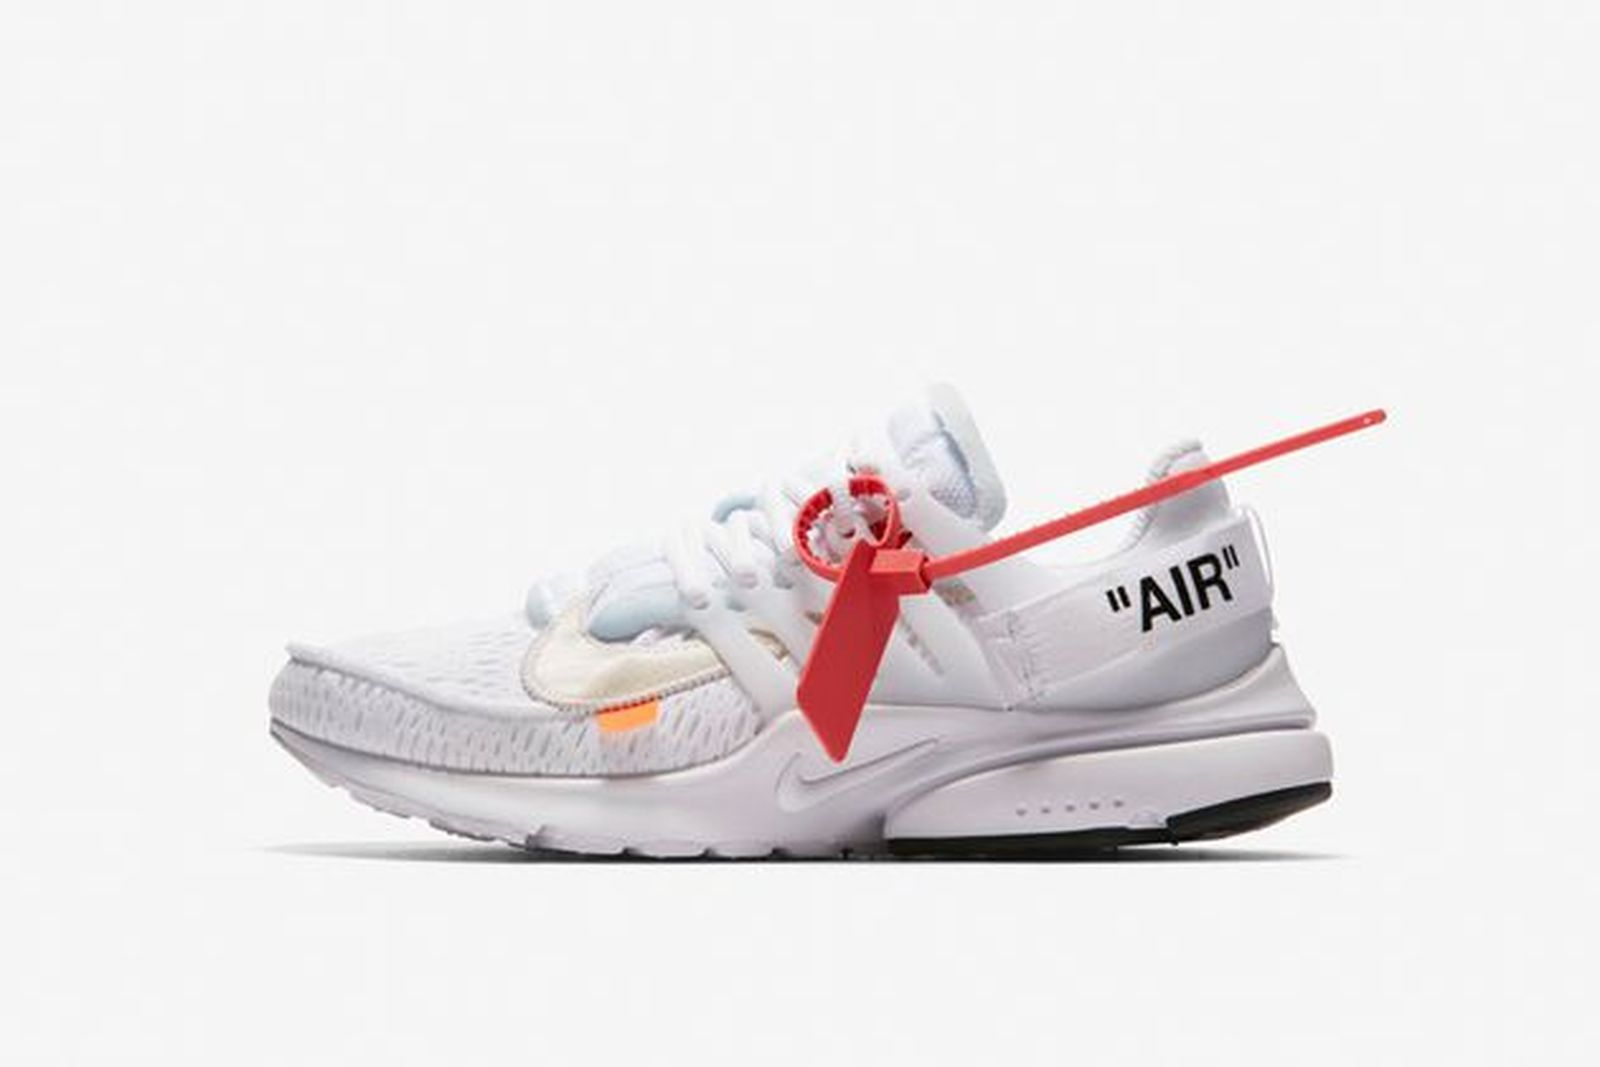 http whatdropsnow.s3.amazonaws.comproduct imagesimages1355819ddd10e022ed48593d37ac08db015bd5c3b7b8b5 GOAT Nike The Ten OFF-WHITE c/o Virgil Abloh